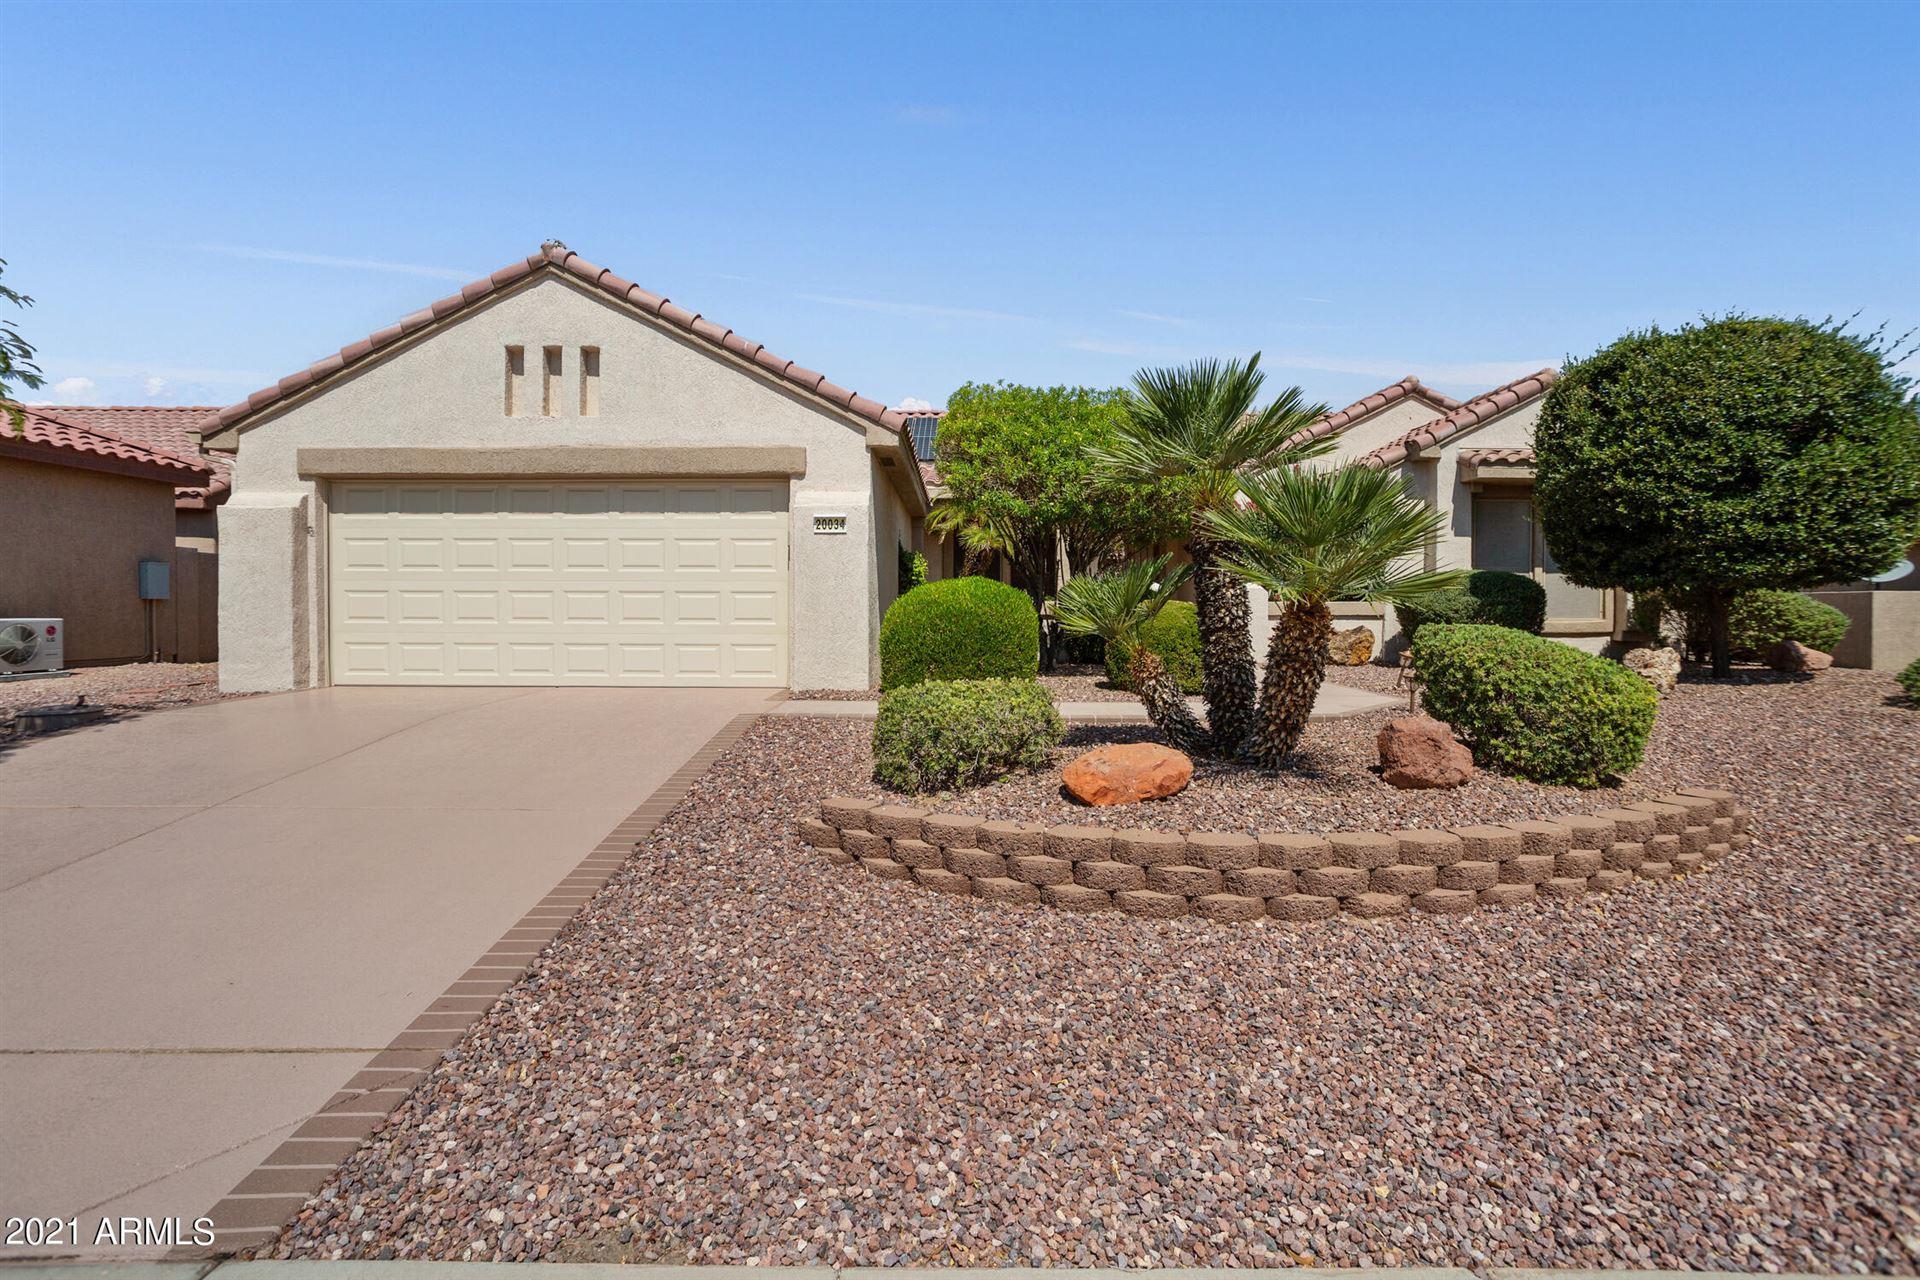 20034 N HEARTHSTONE Drive, Surprise, AZ 85374 - MLS#: 6249672